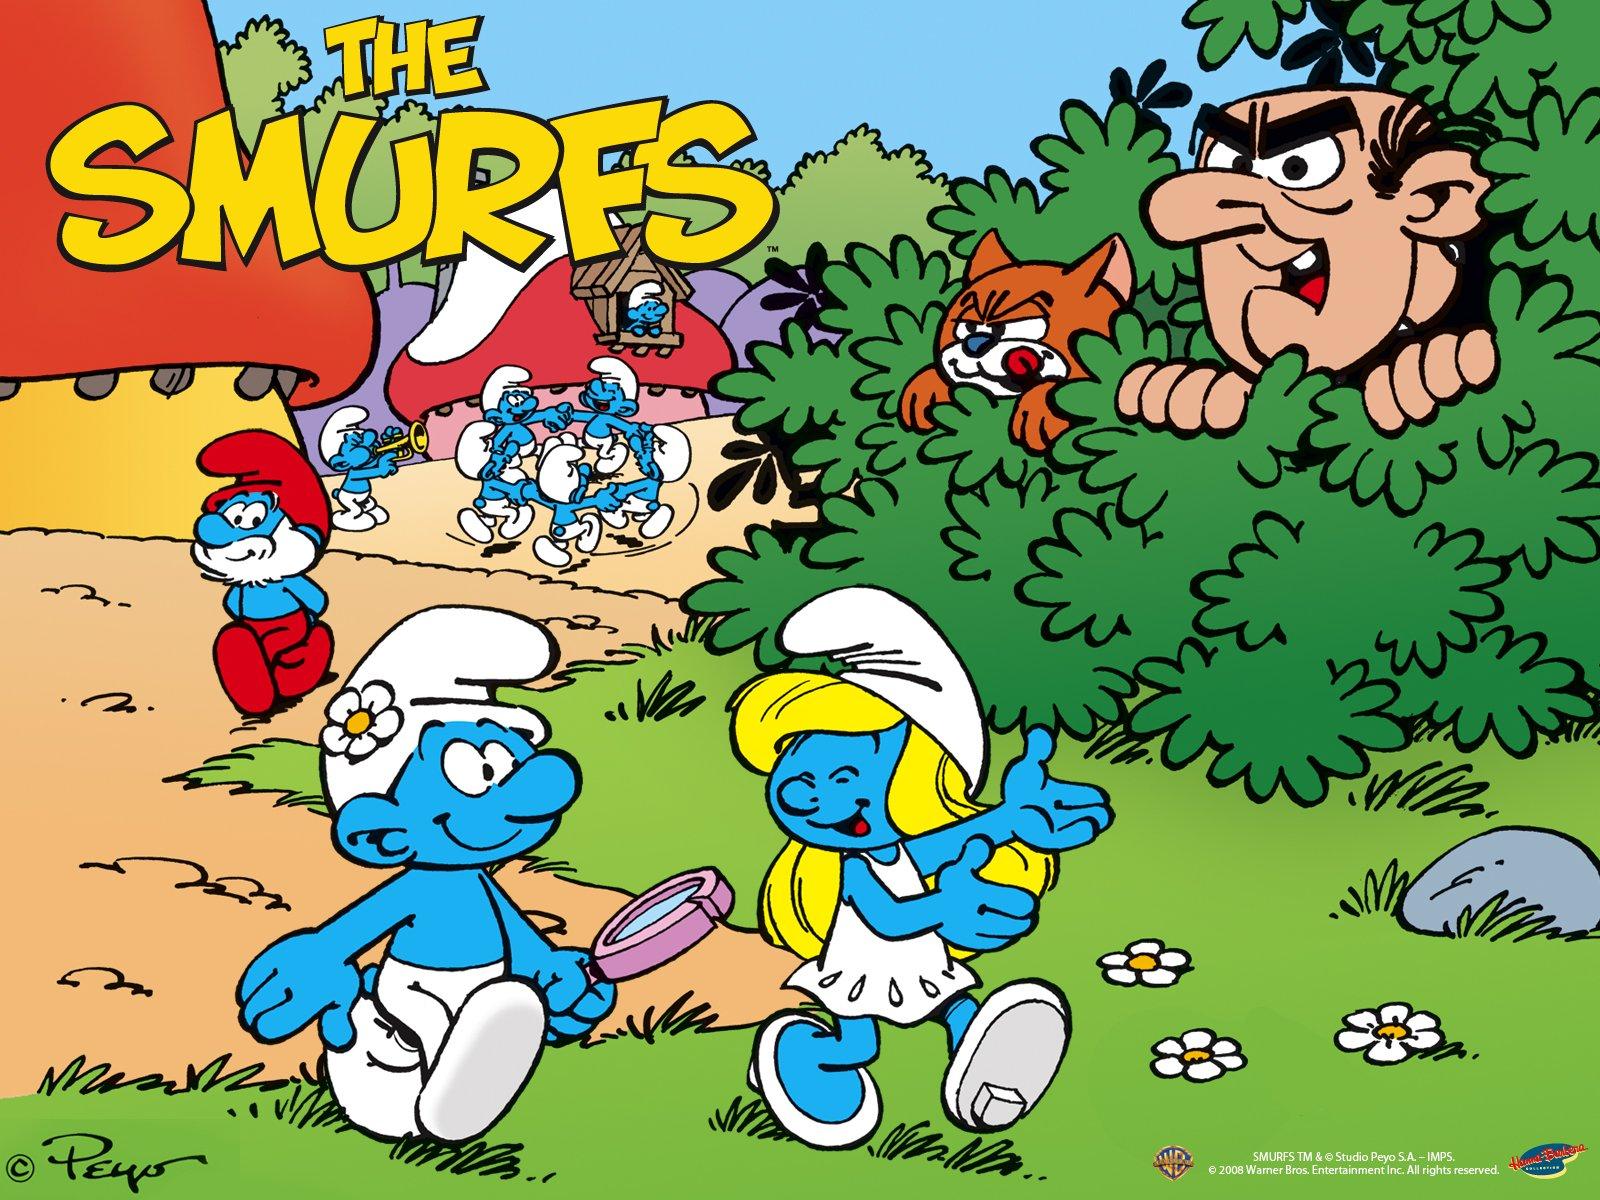 Watch The Smurfs Volume 1 | Prime Video